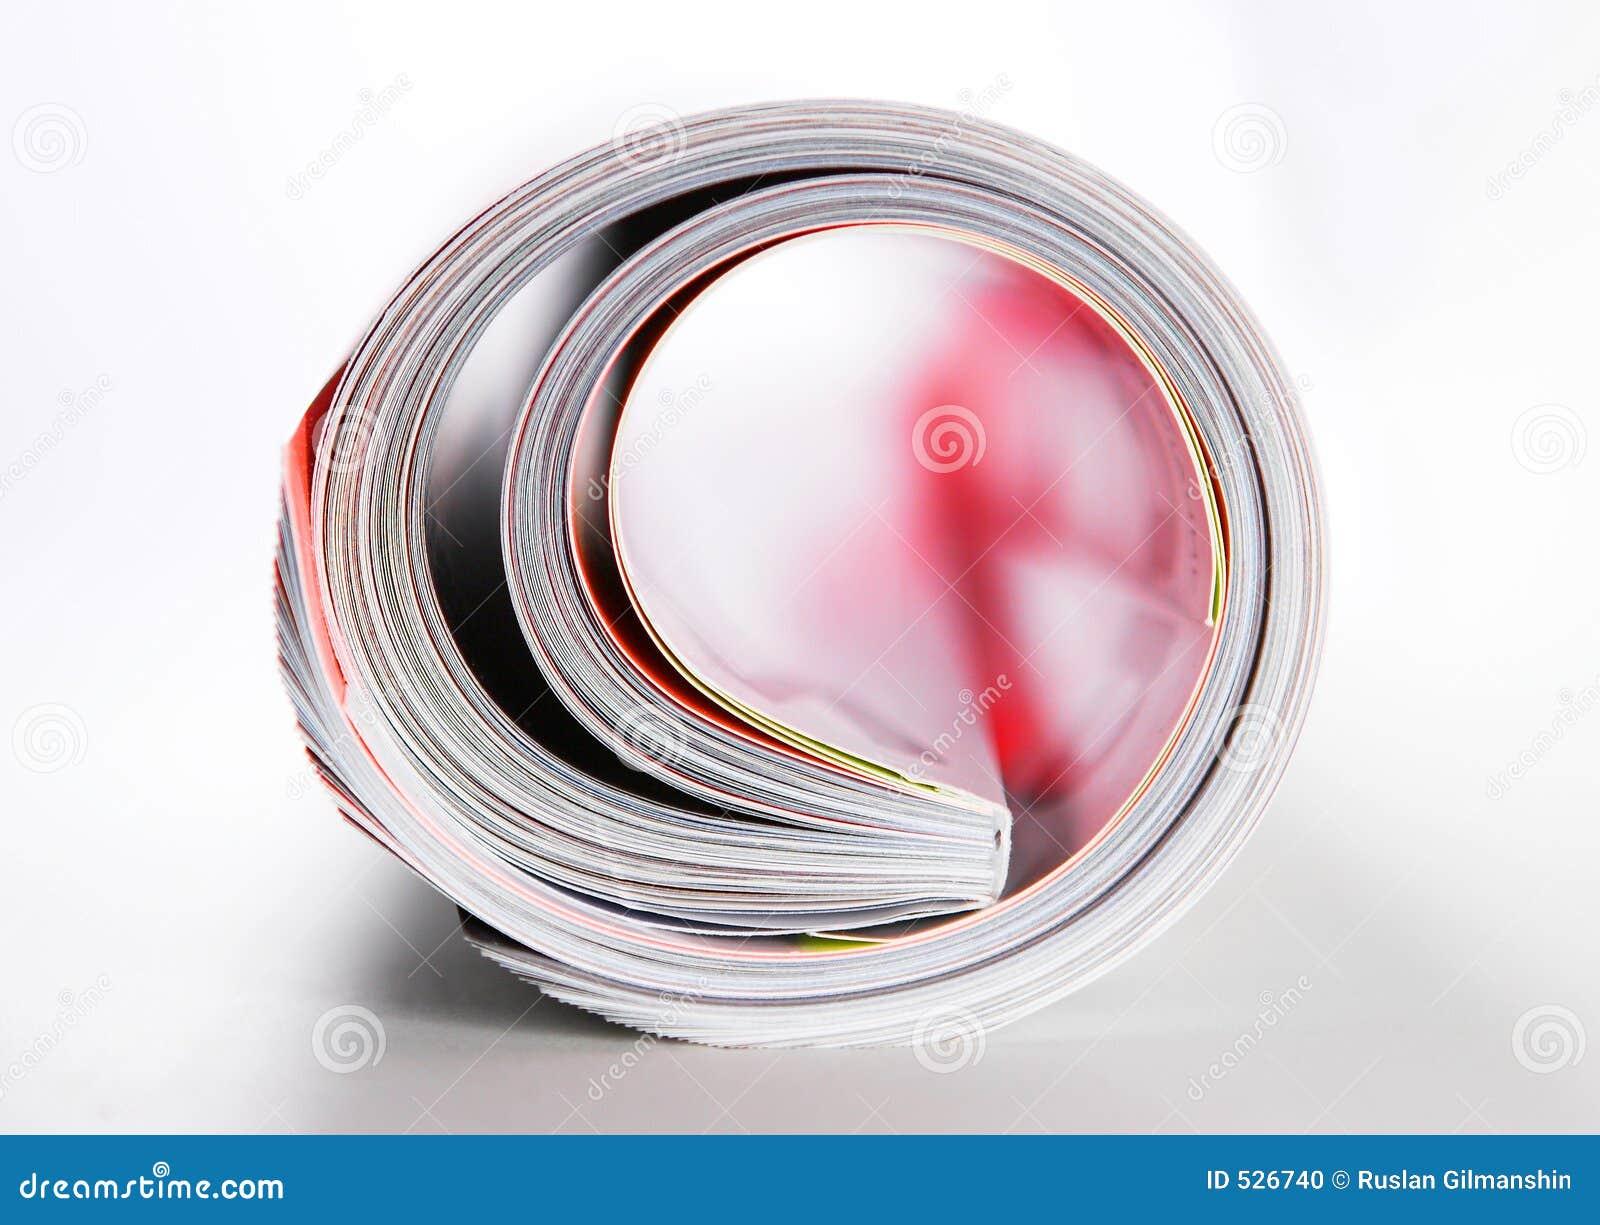 Download 杂志 库存照片. 图片 包括有 更新, 发行, mag, 社论, 打印, 媒体, 房子, 杂志, 报表, 纸张 - 526740